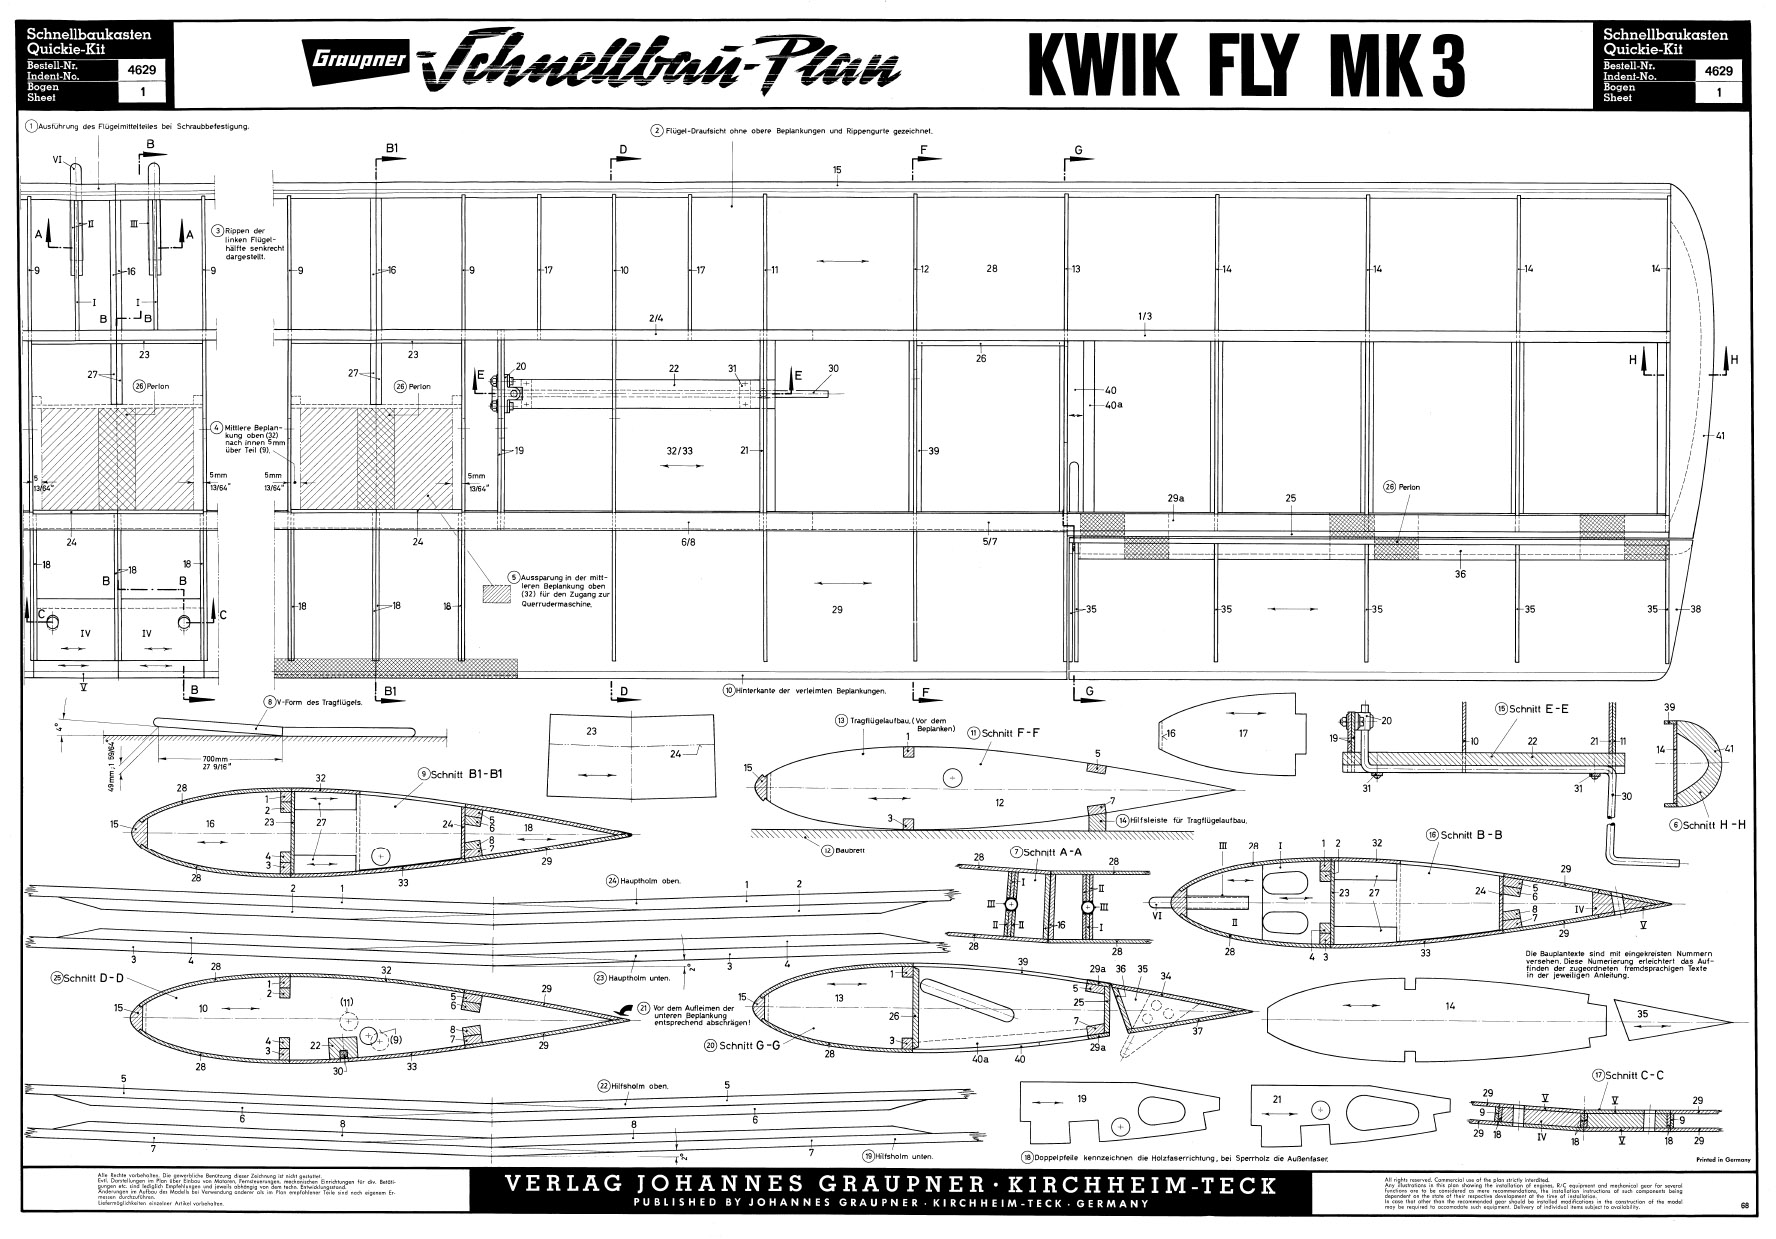 Liasse de plans pdf du Kwik FLy Mark 3 de Graupner